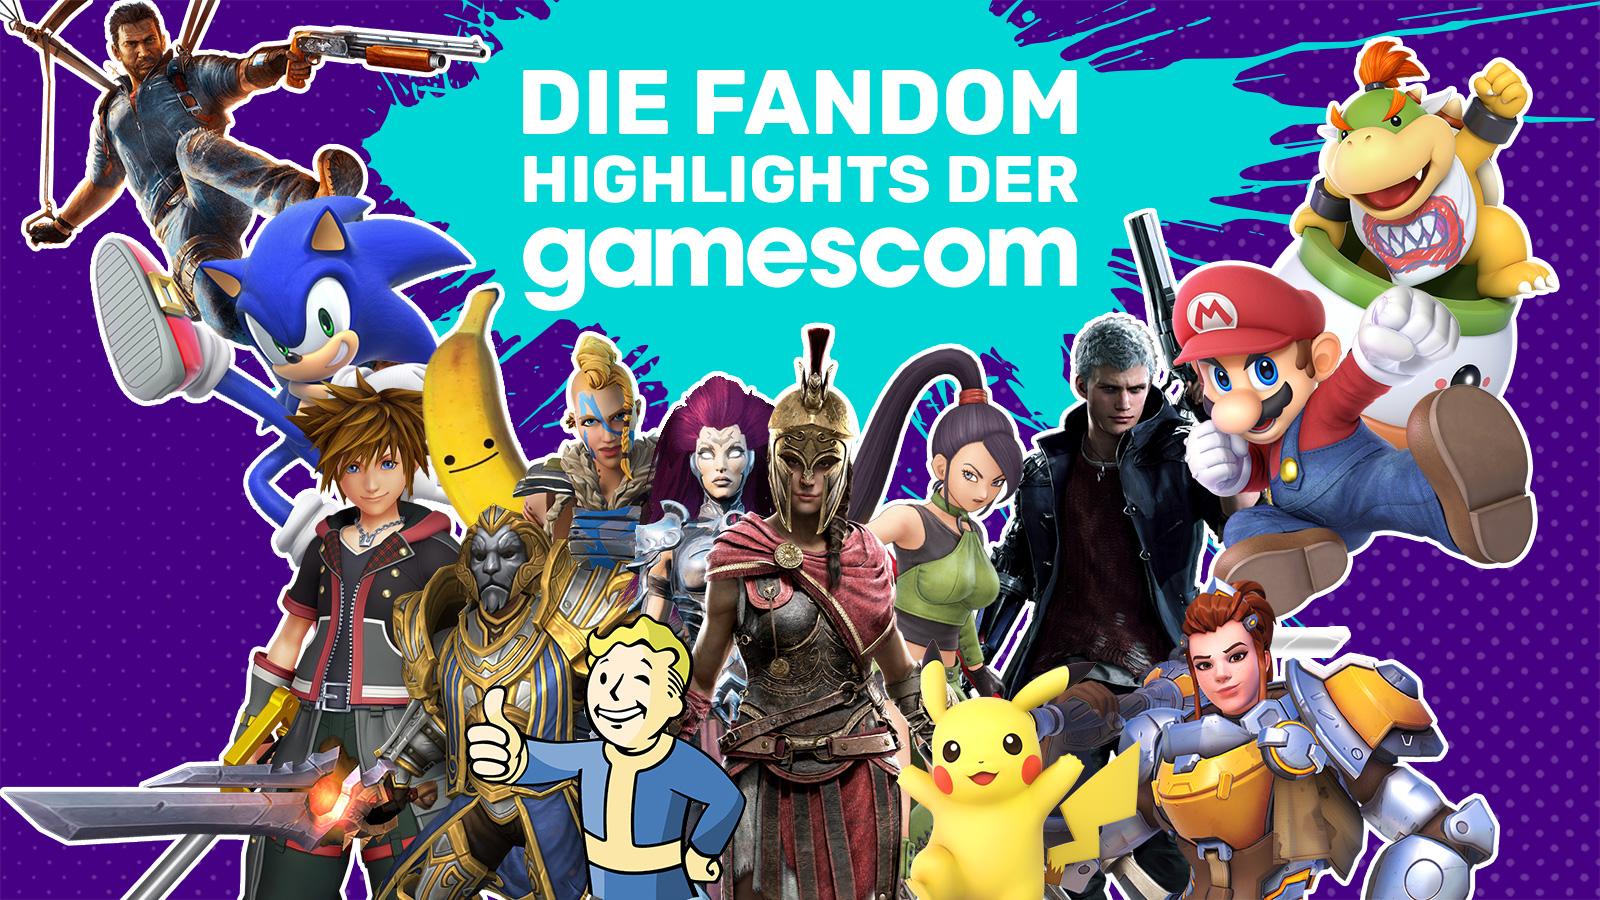 DE FANDOM - gamescom 2018 keyart